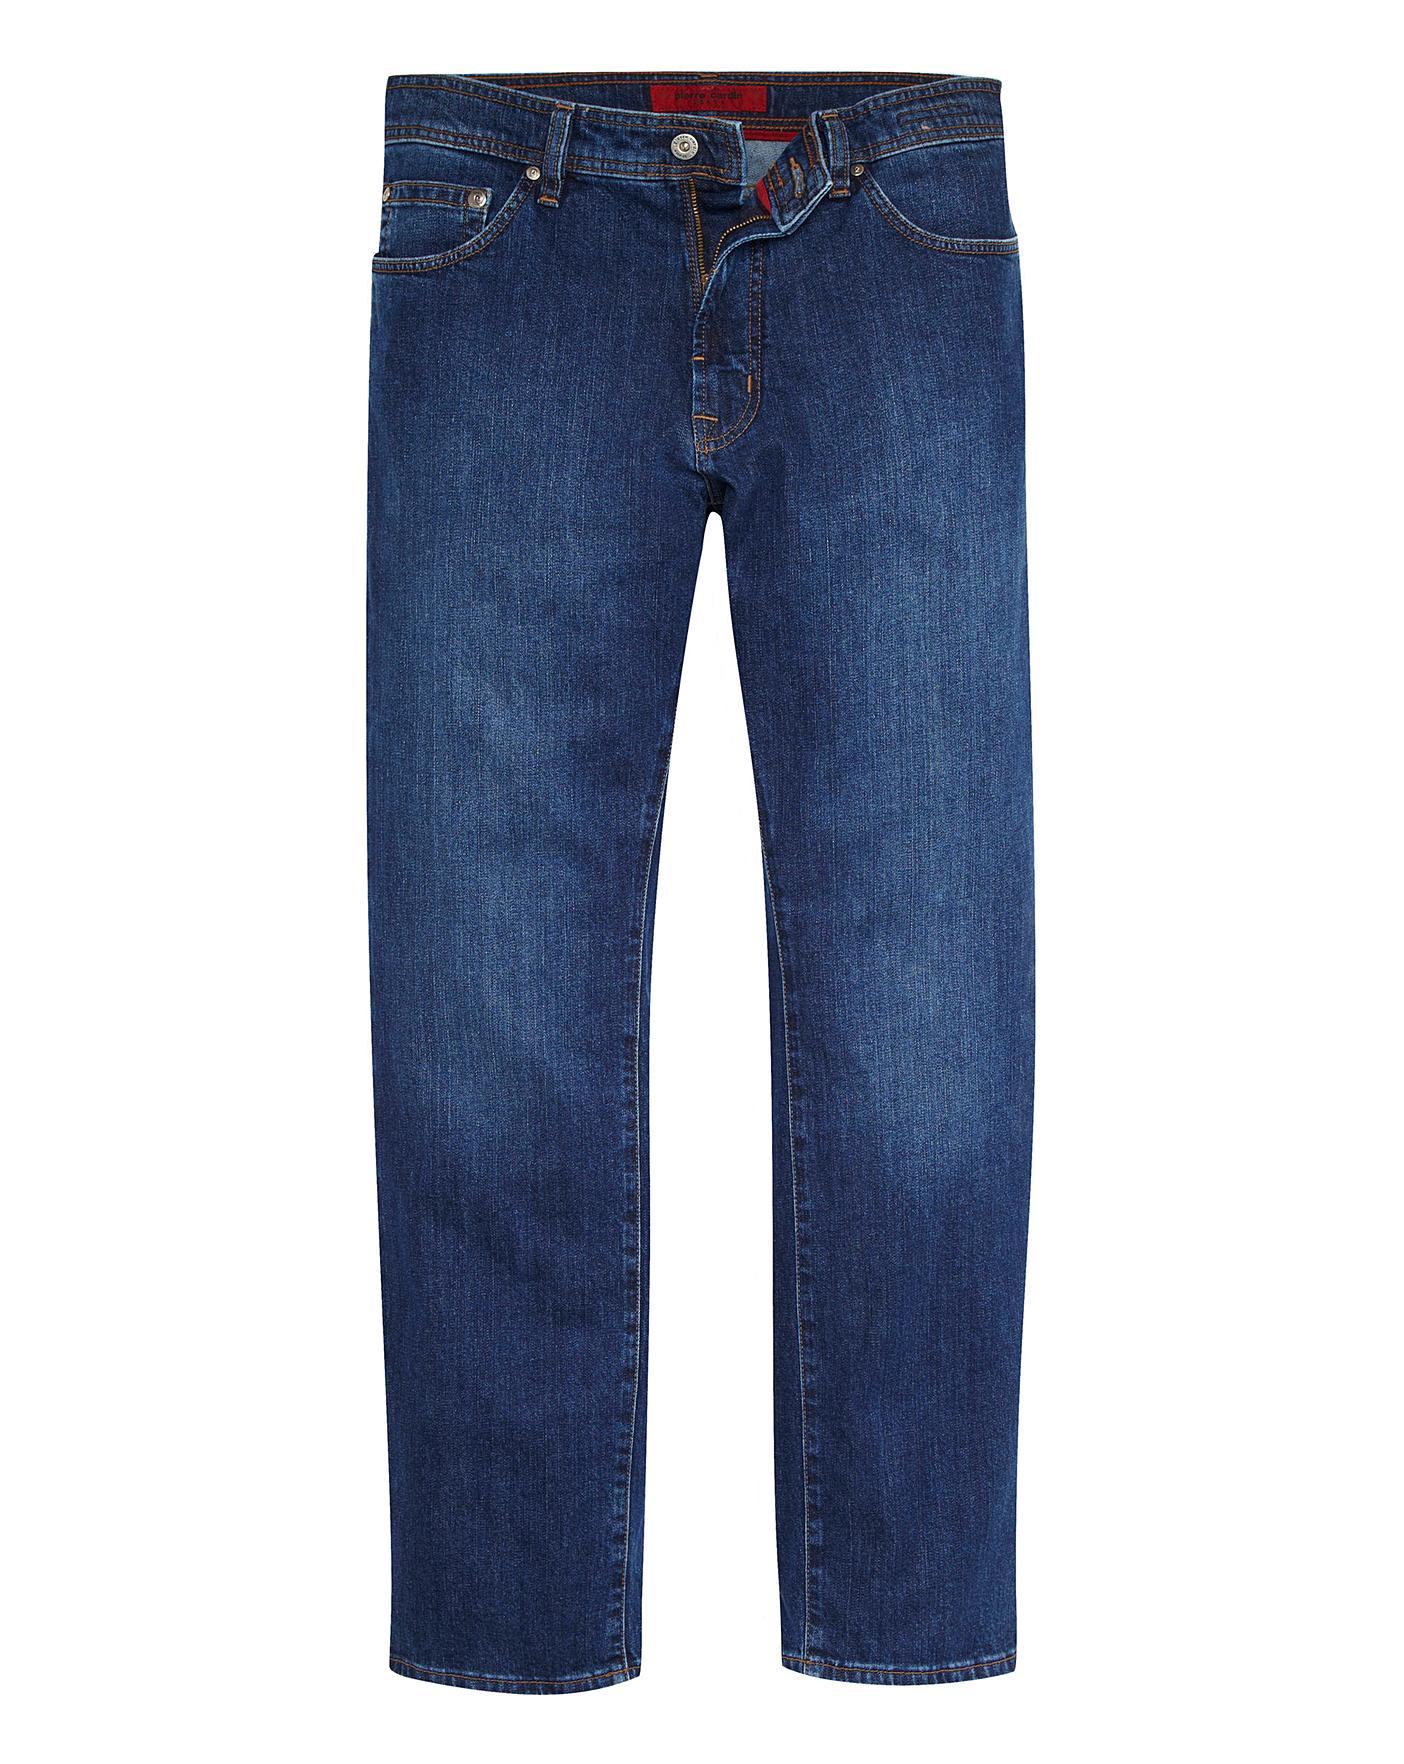 release date: meet coupon code Pierre Cardin Mid Wash Jeans 34in Leg